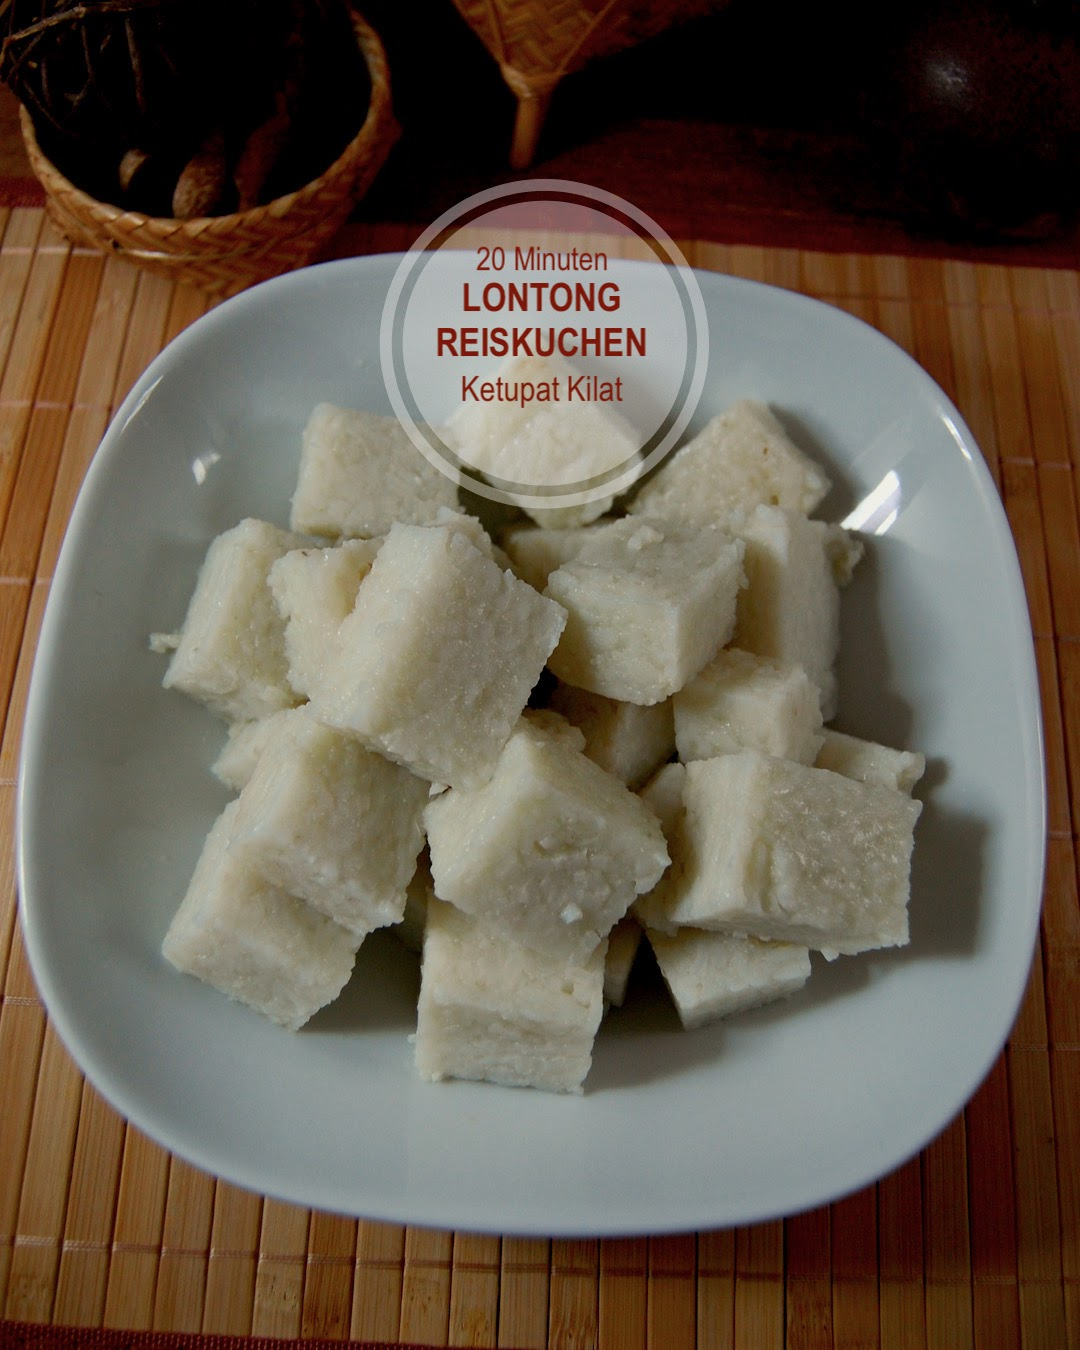 Rezept Ketupat Kilat, Reiskuchen schnell Einfach